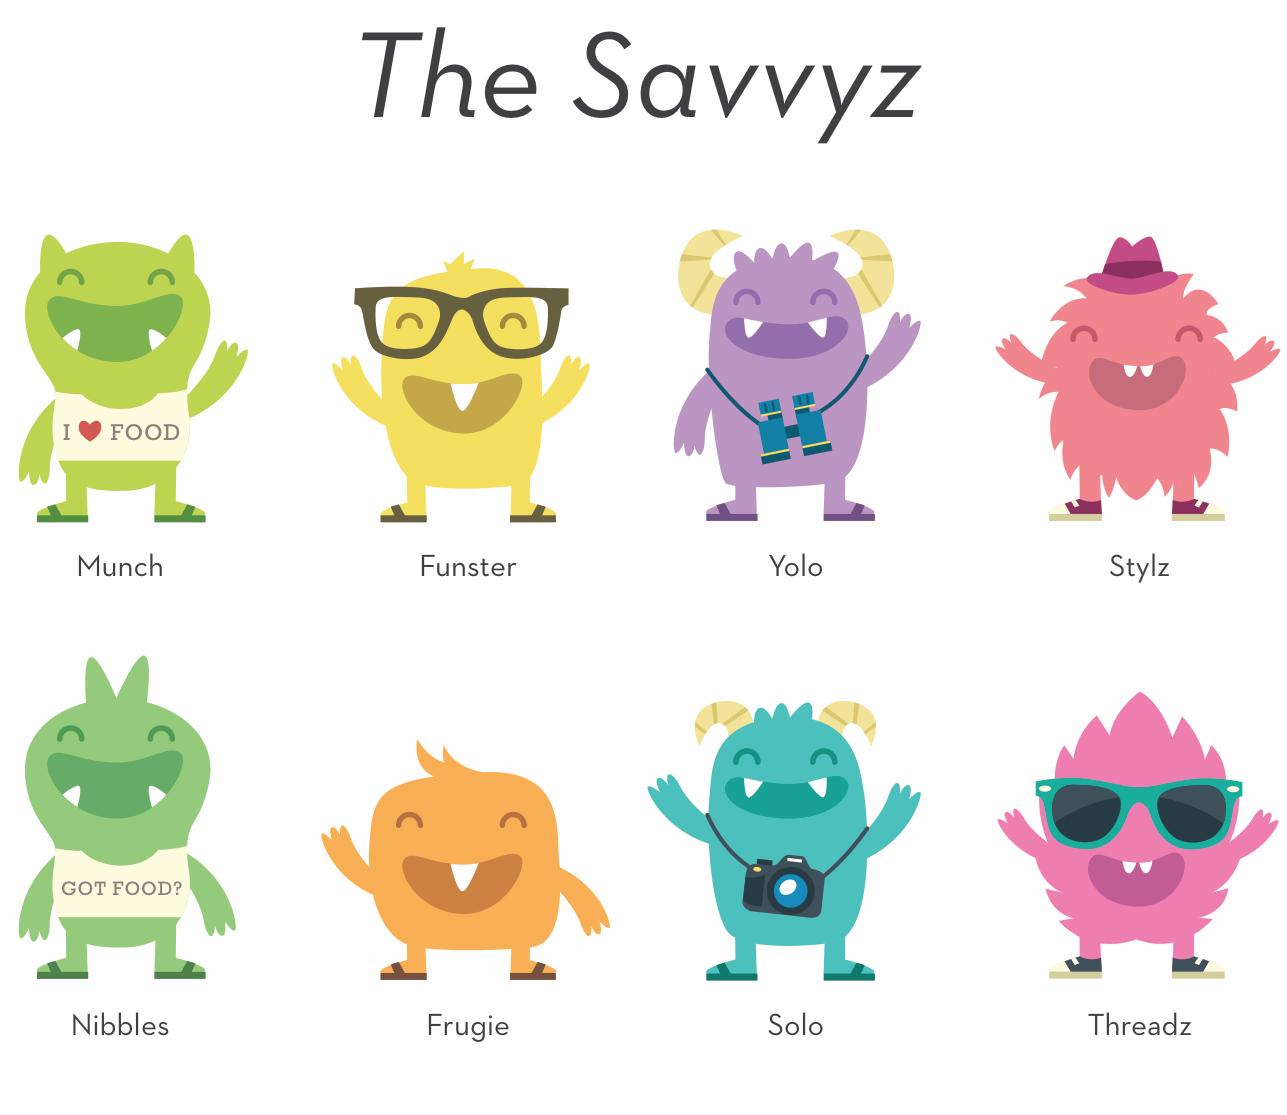 The Savvyz Monsters